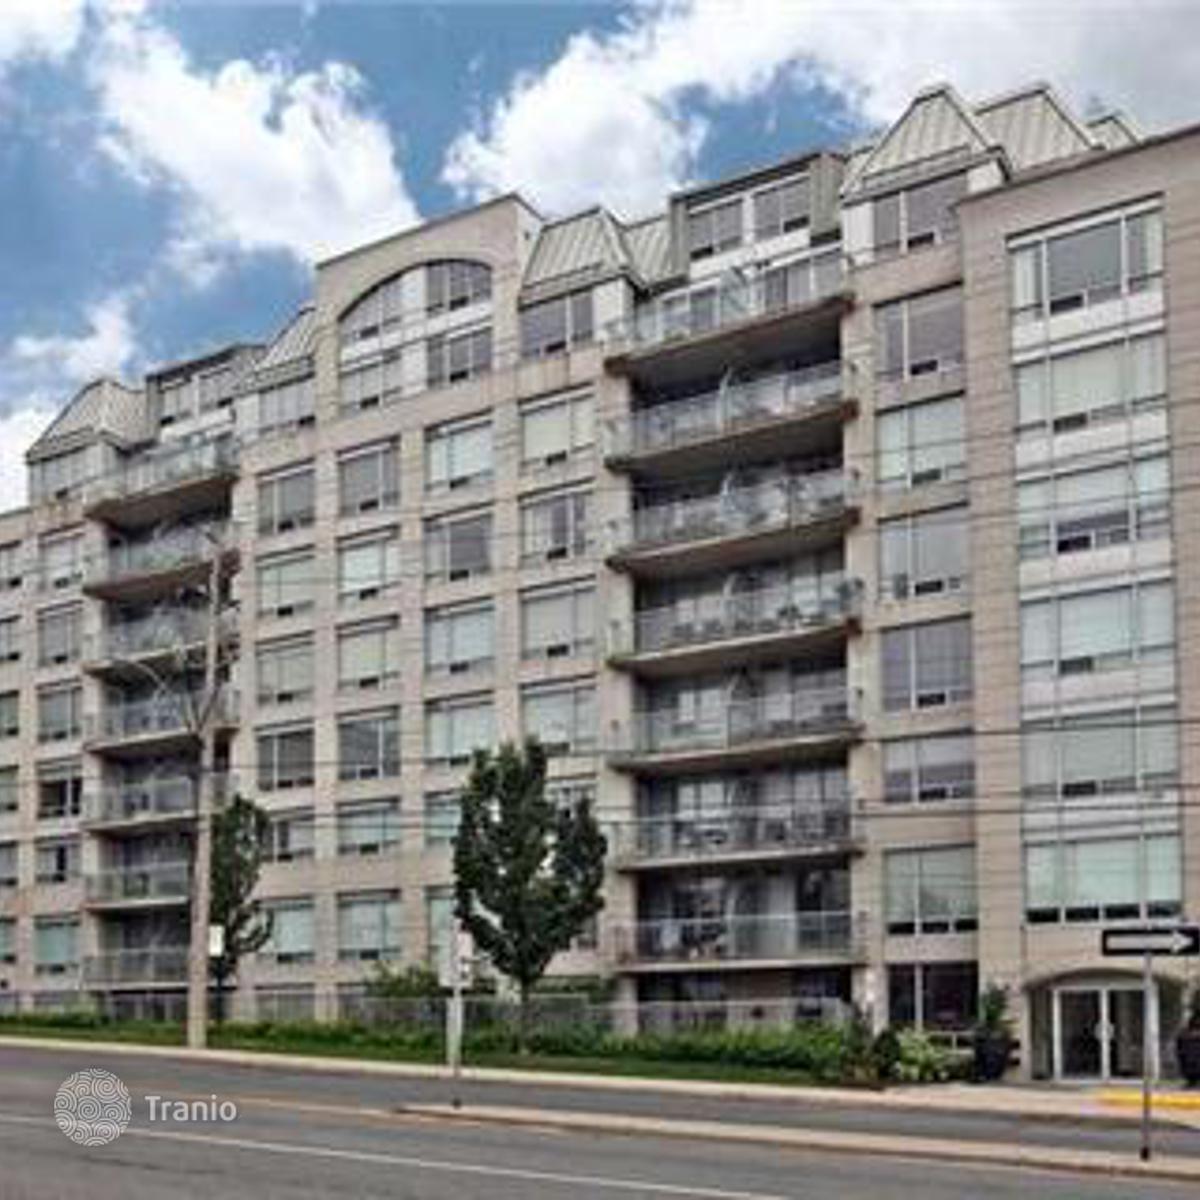 Canadian Apartments: Listing #1339237 In Toronto, Ontario, Canada